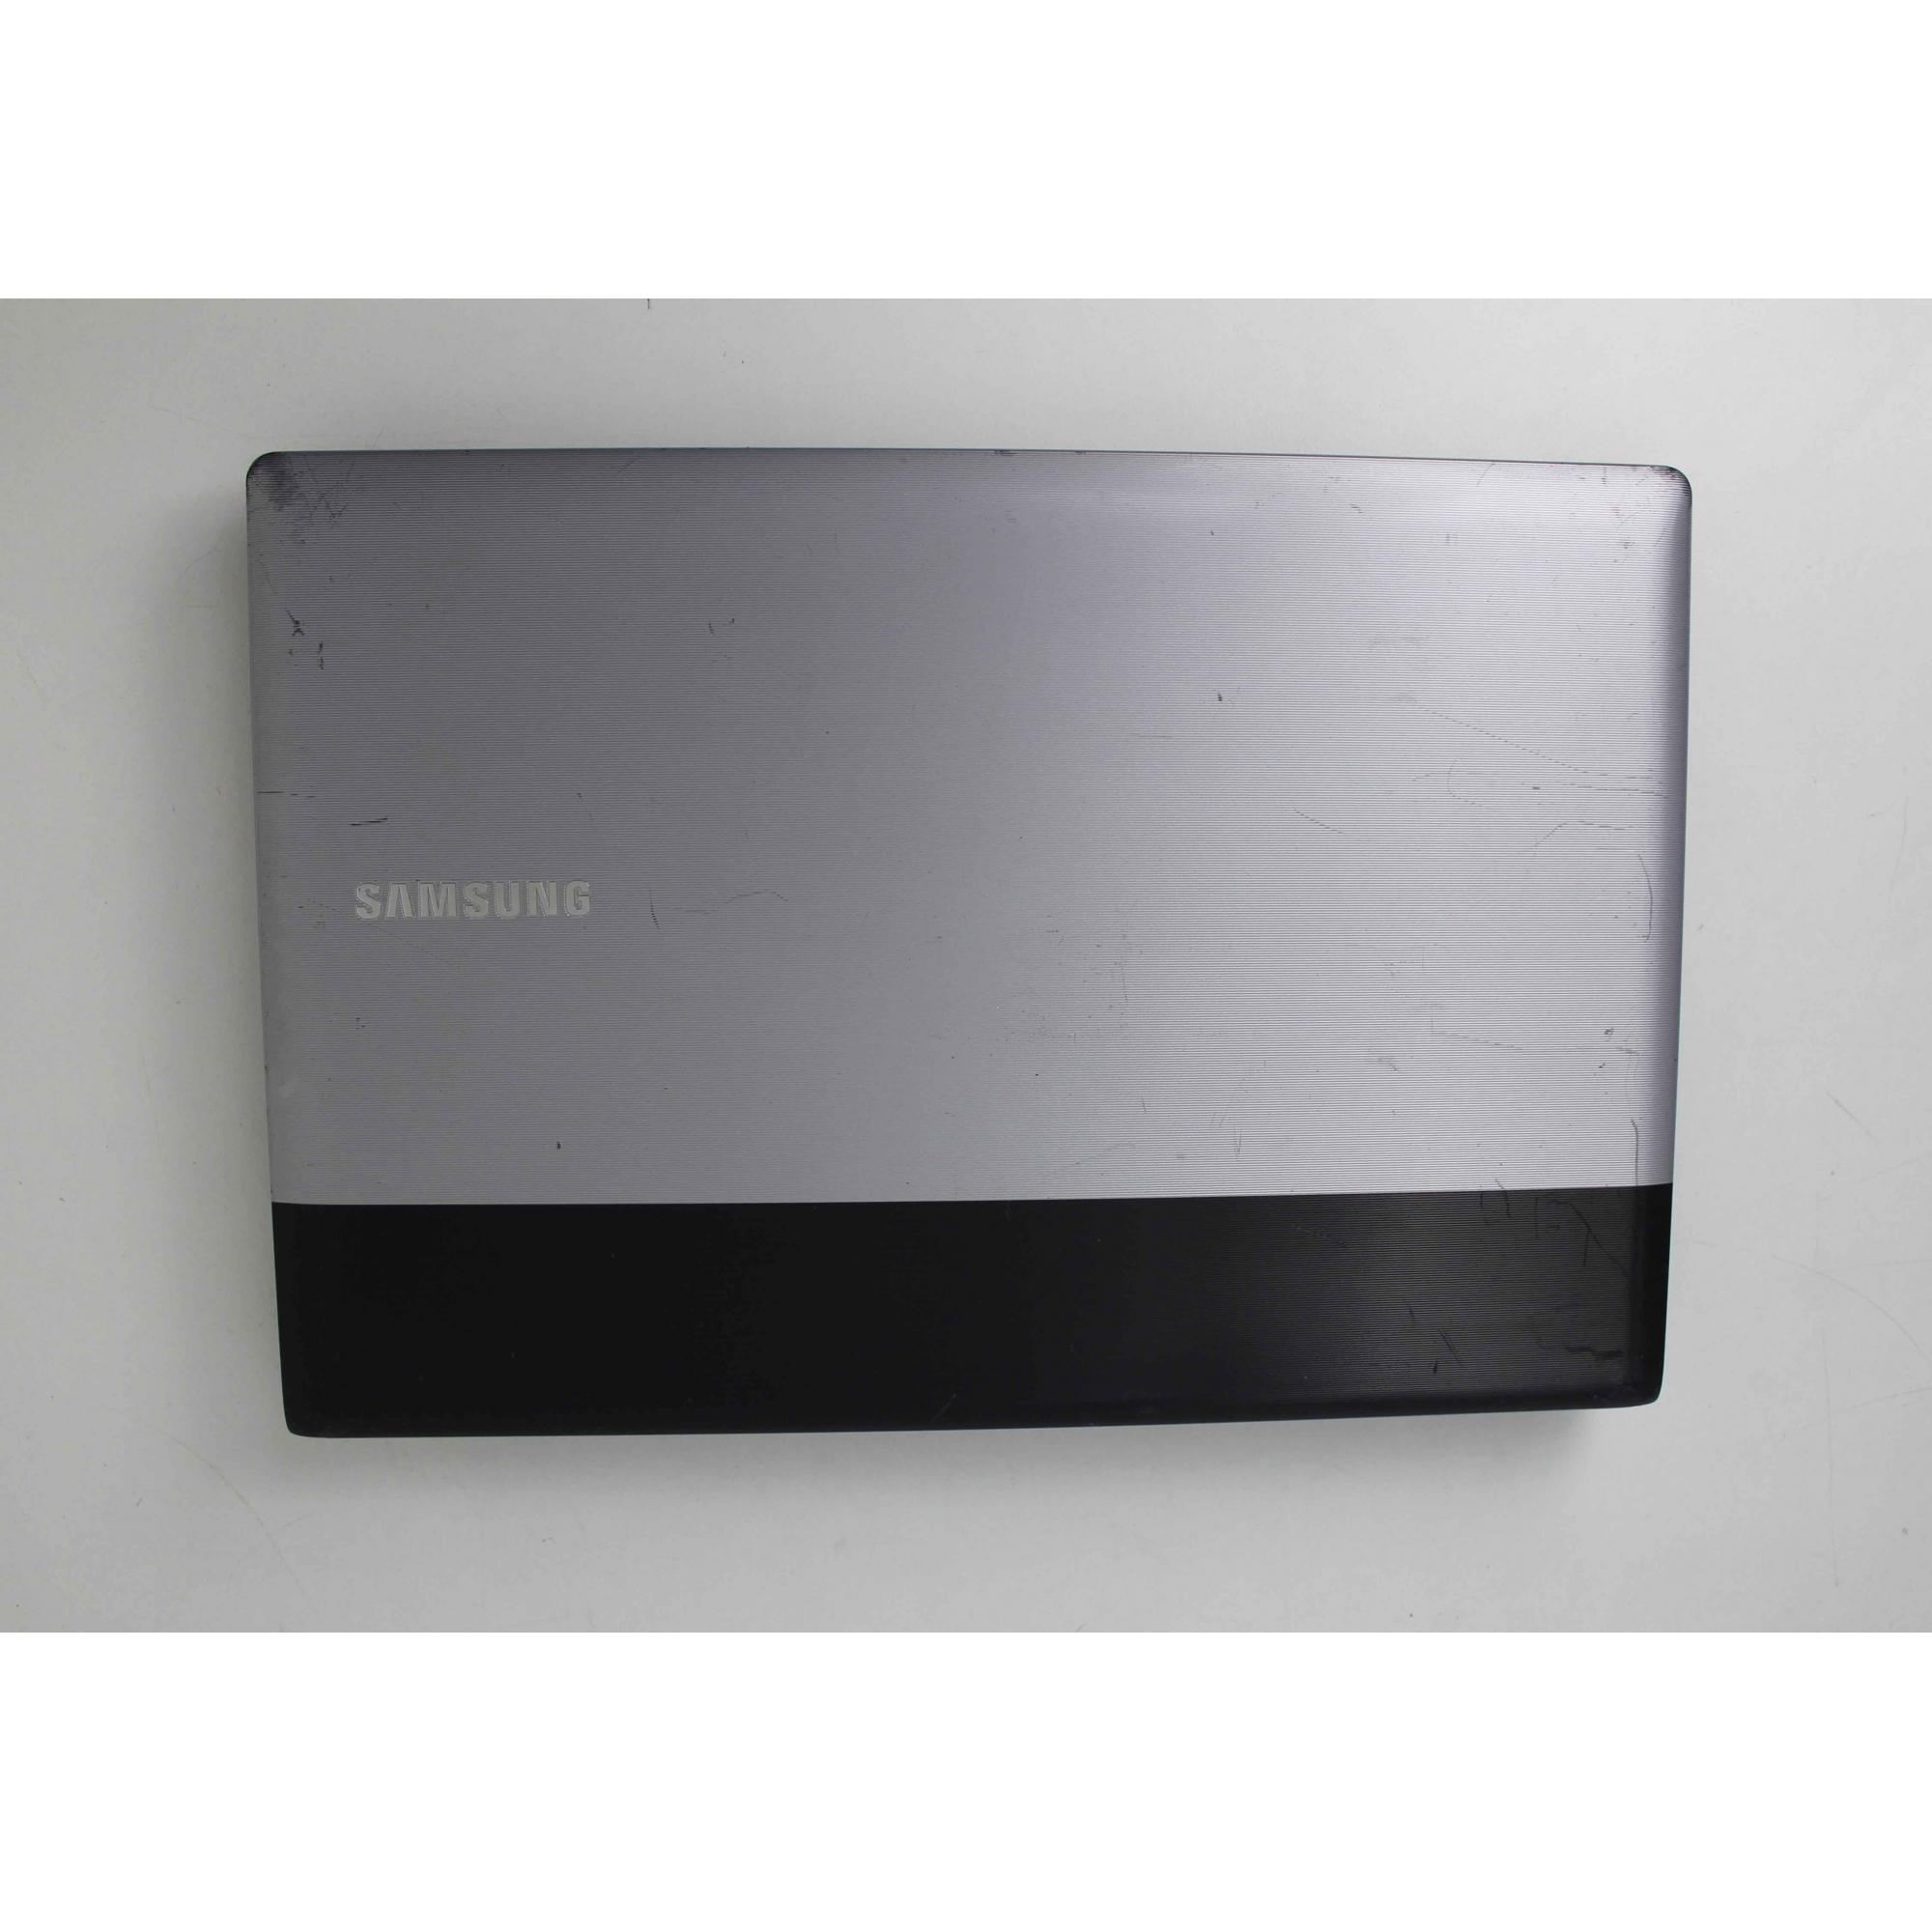 "NOTEBOOK SAMSUNG RV420 14"" INTEL CORE I5 2.3GHZ 4GB HD-640GB"